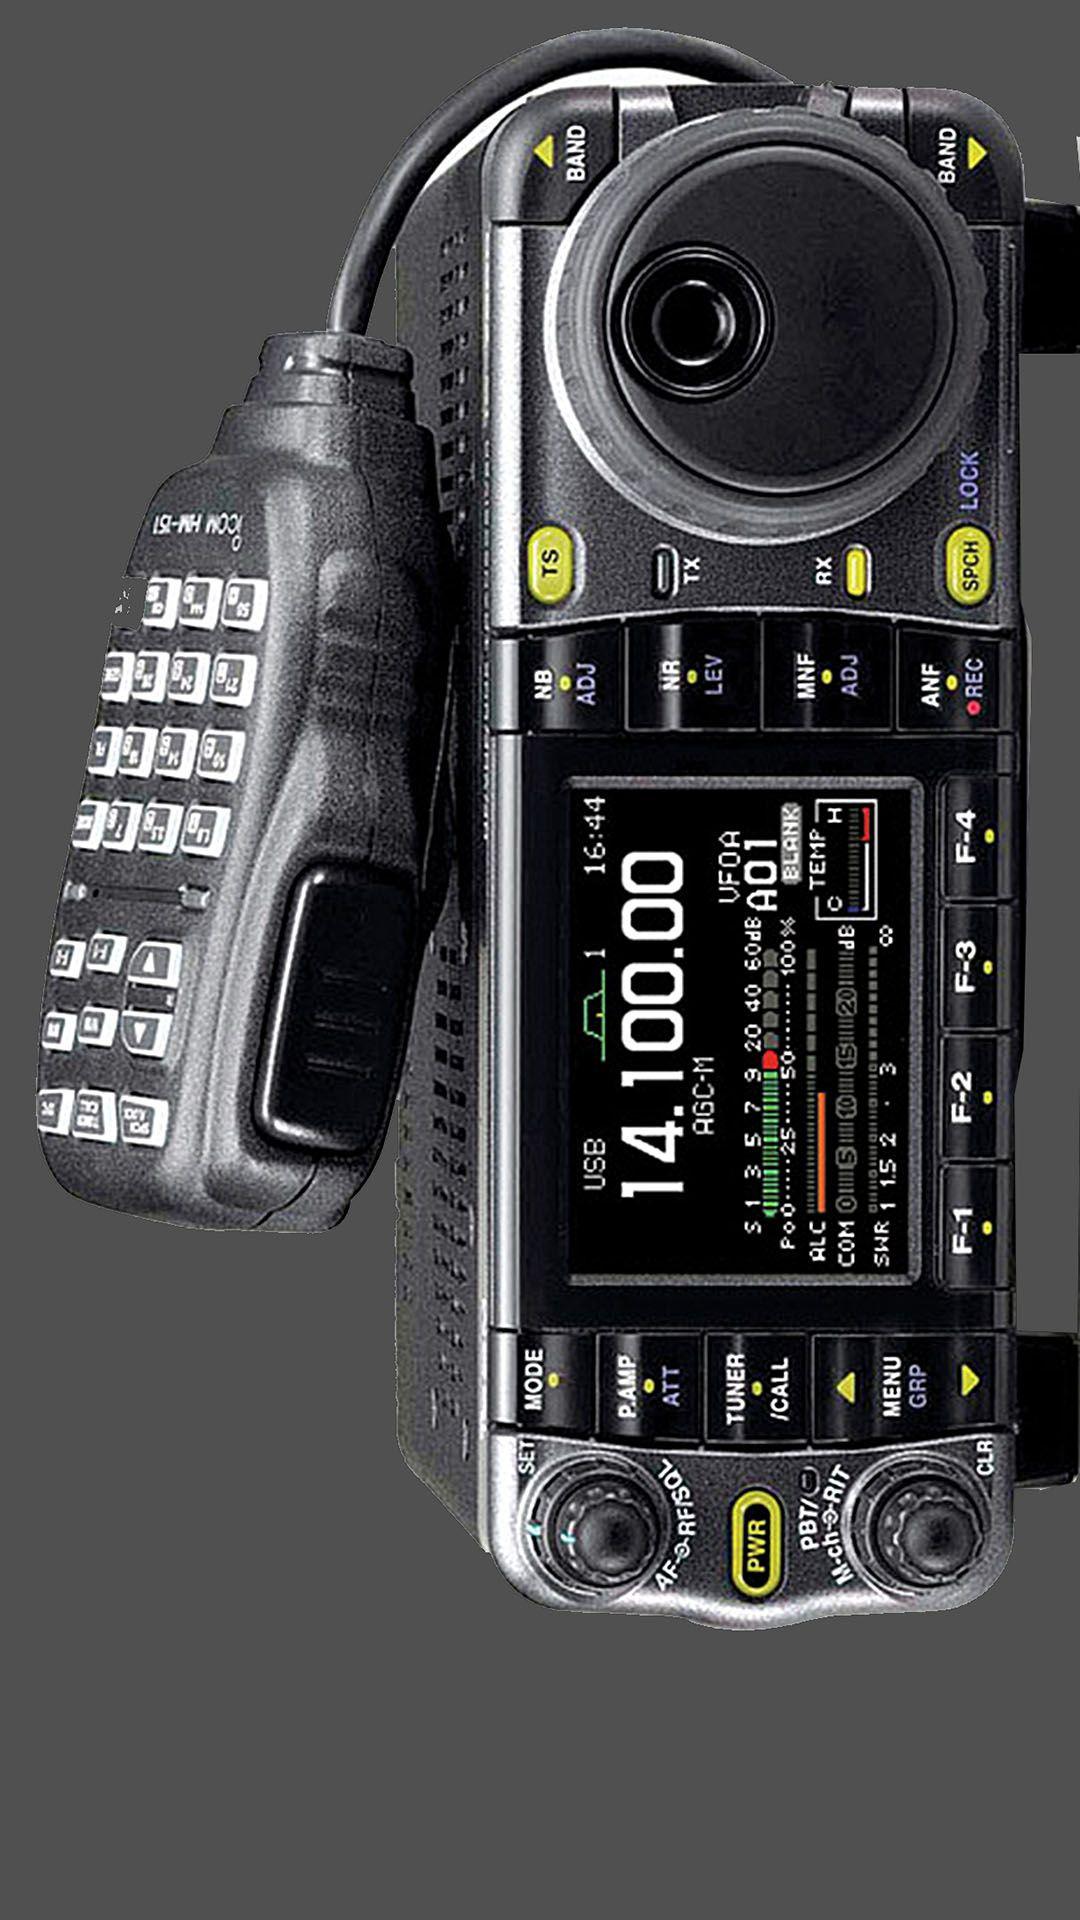 icom ic 7000 1080 ham rig 1920 pinterest hams ham radio and